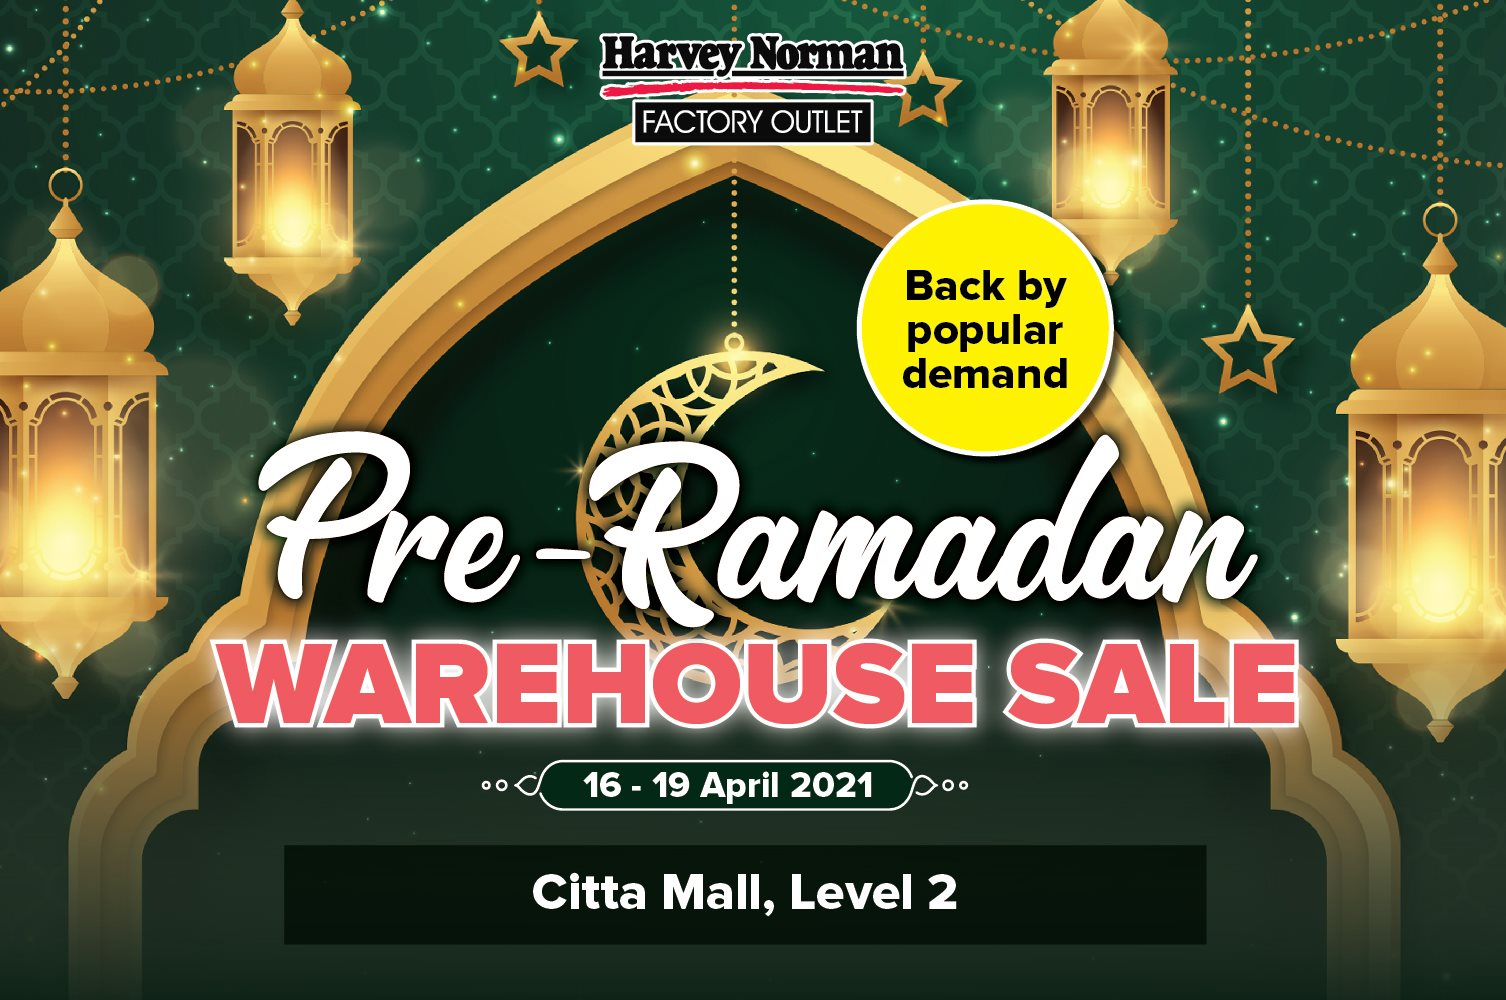 Harvey-NOrman-Warehouse-Sale-2021-Jualan-Gudang-Main-Citta-Mall - Electronics & Computers Furniture Home Appliances Home Decor Kitchen Appliances Selangor Warehouse Sale & Clearance in Malaysia